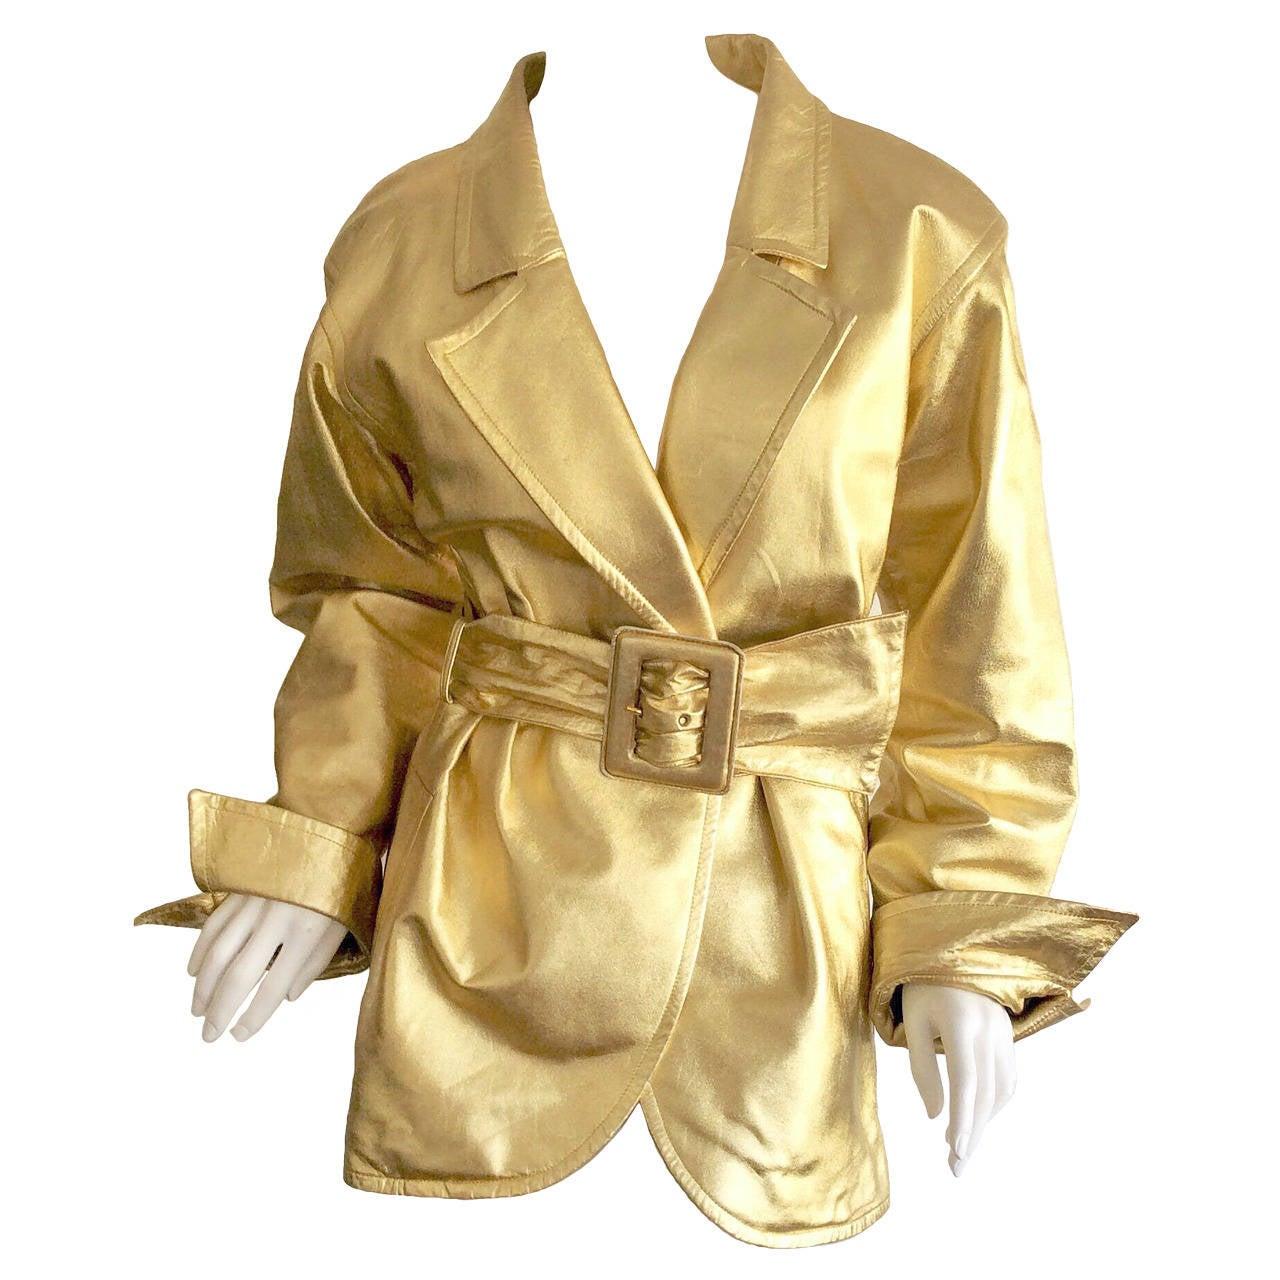 Vintage Yves Saint Laurent ' Rive Gauche ' Belted Gold Leather Jacket 1